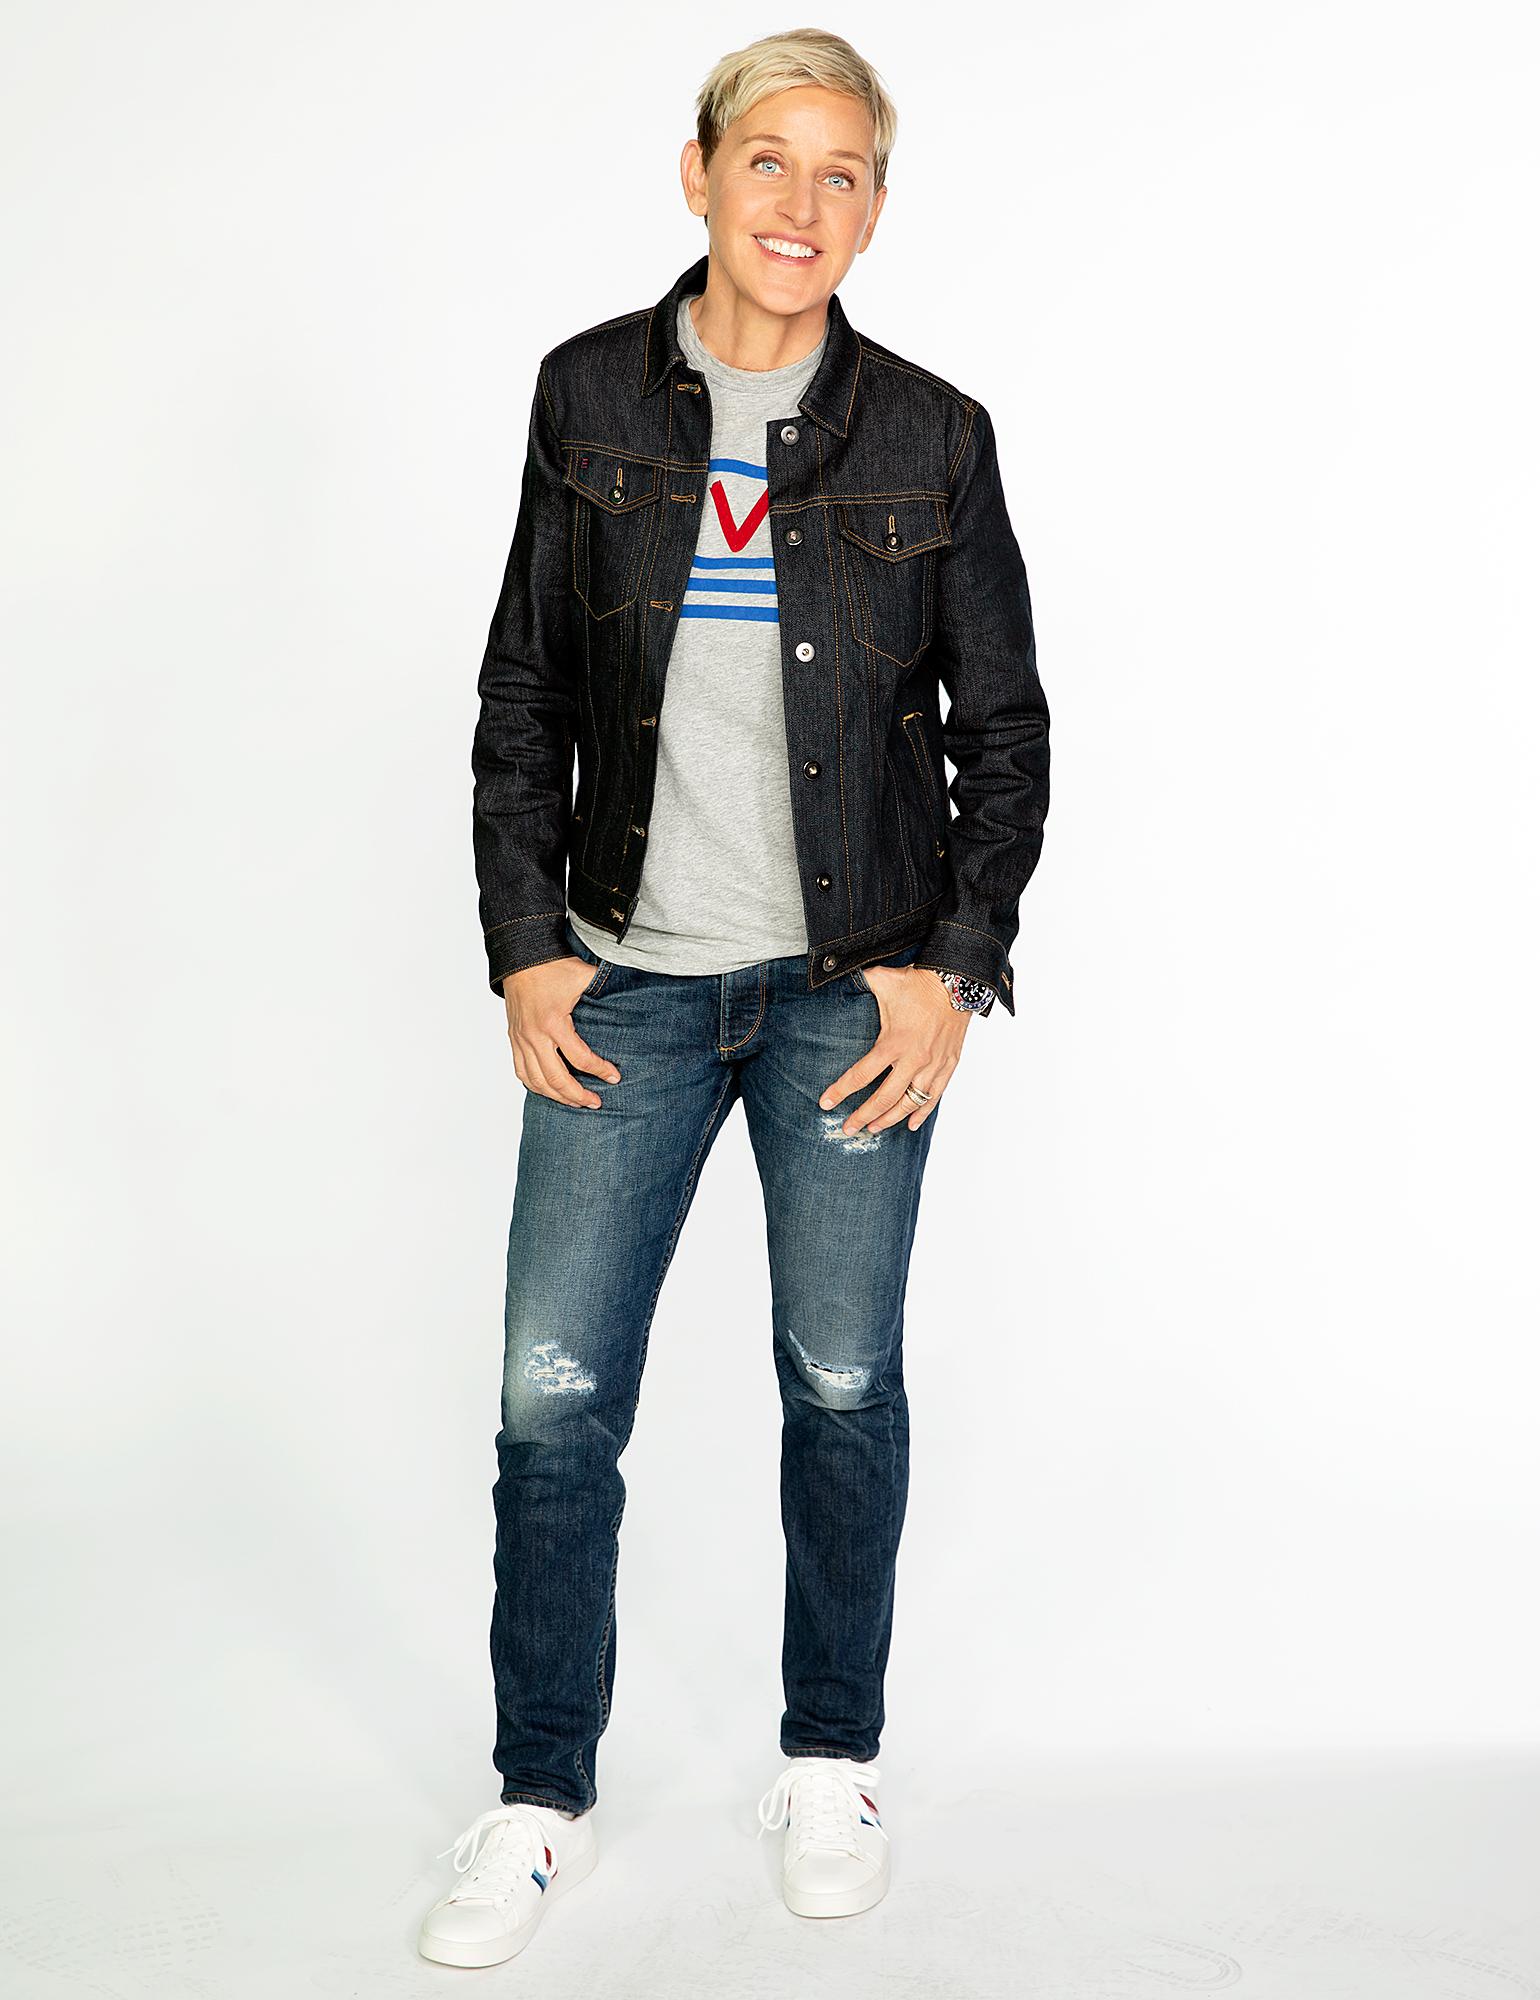 Ellen DeGeneres Fashion Designer